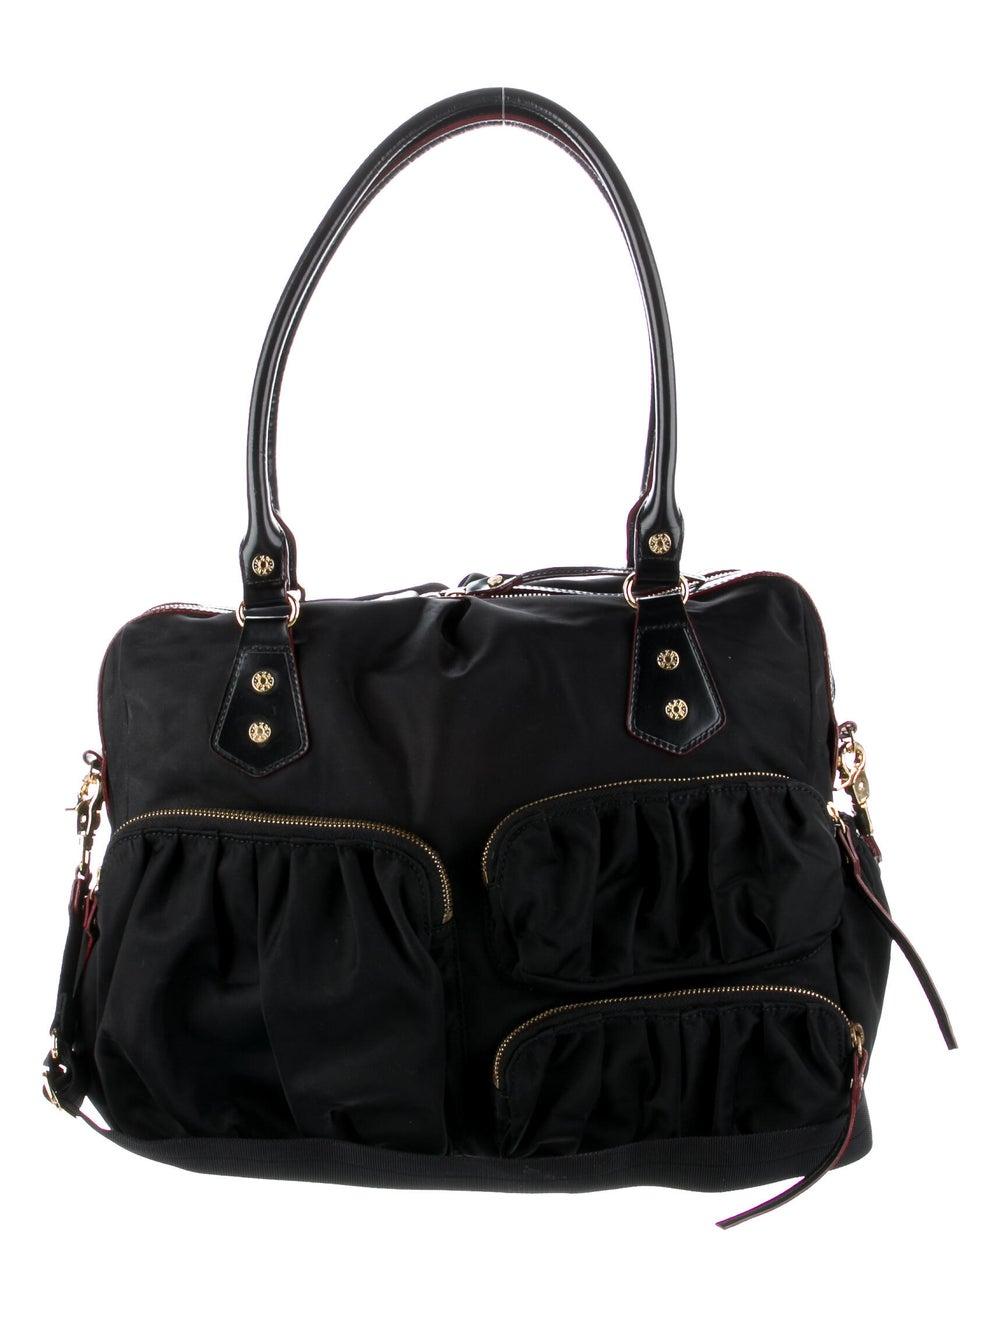 MZ Wallace Leather-Trimmed Nylon Shoulder Bag Bla… - image 1